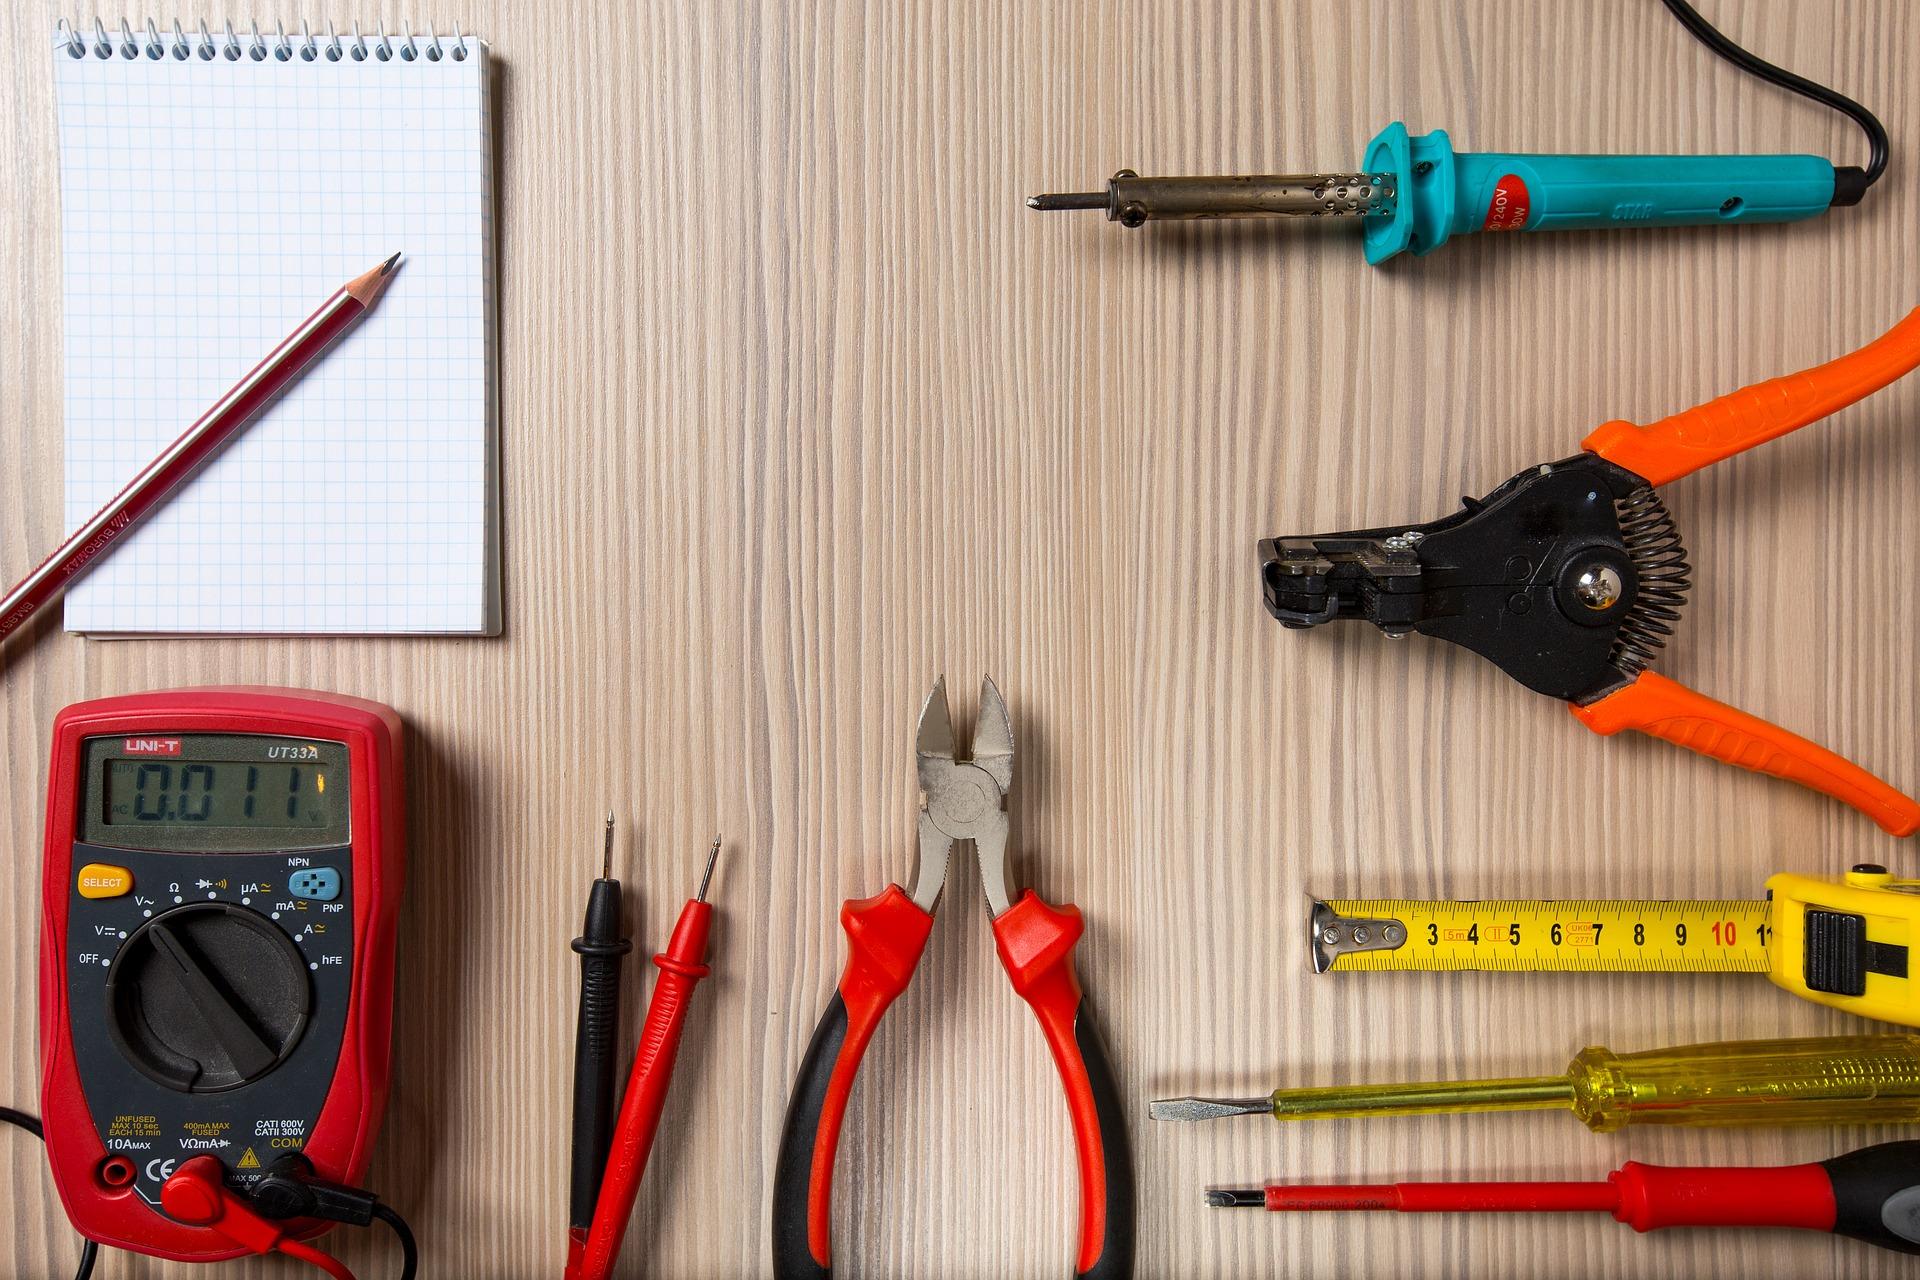 En samling verktyg på ett bord